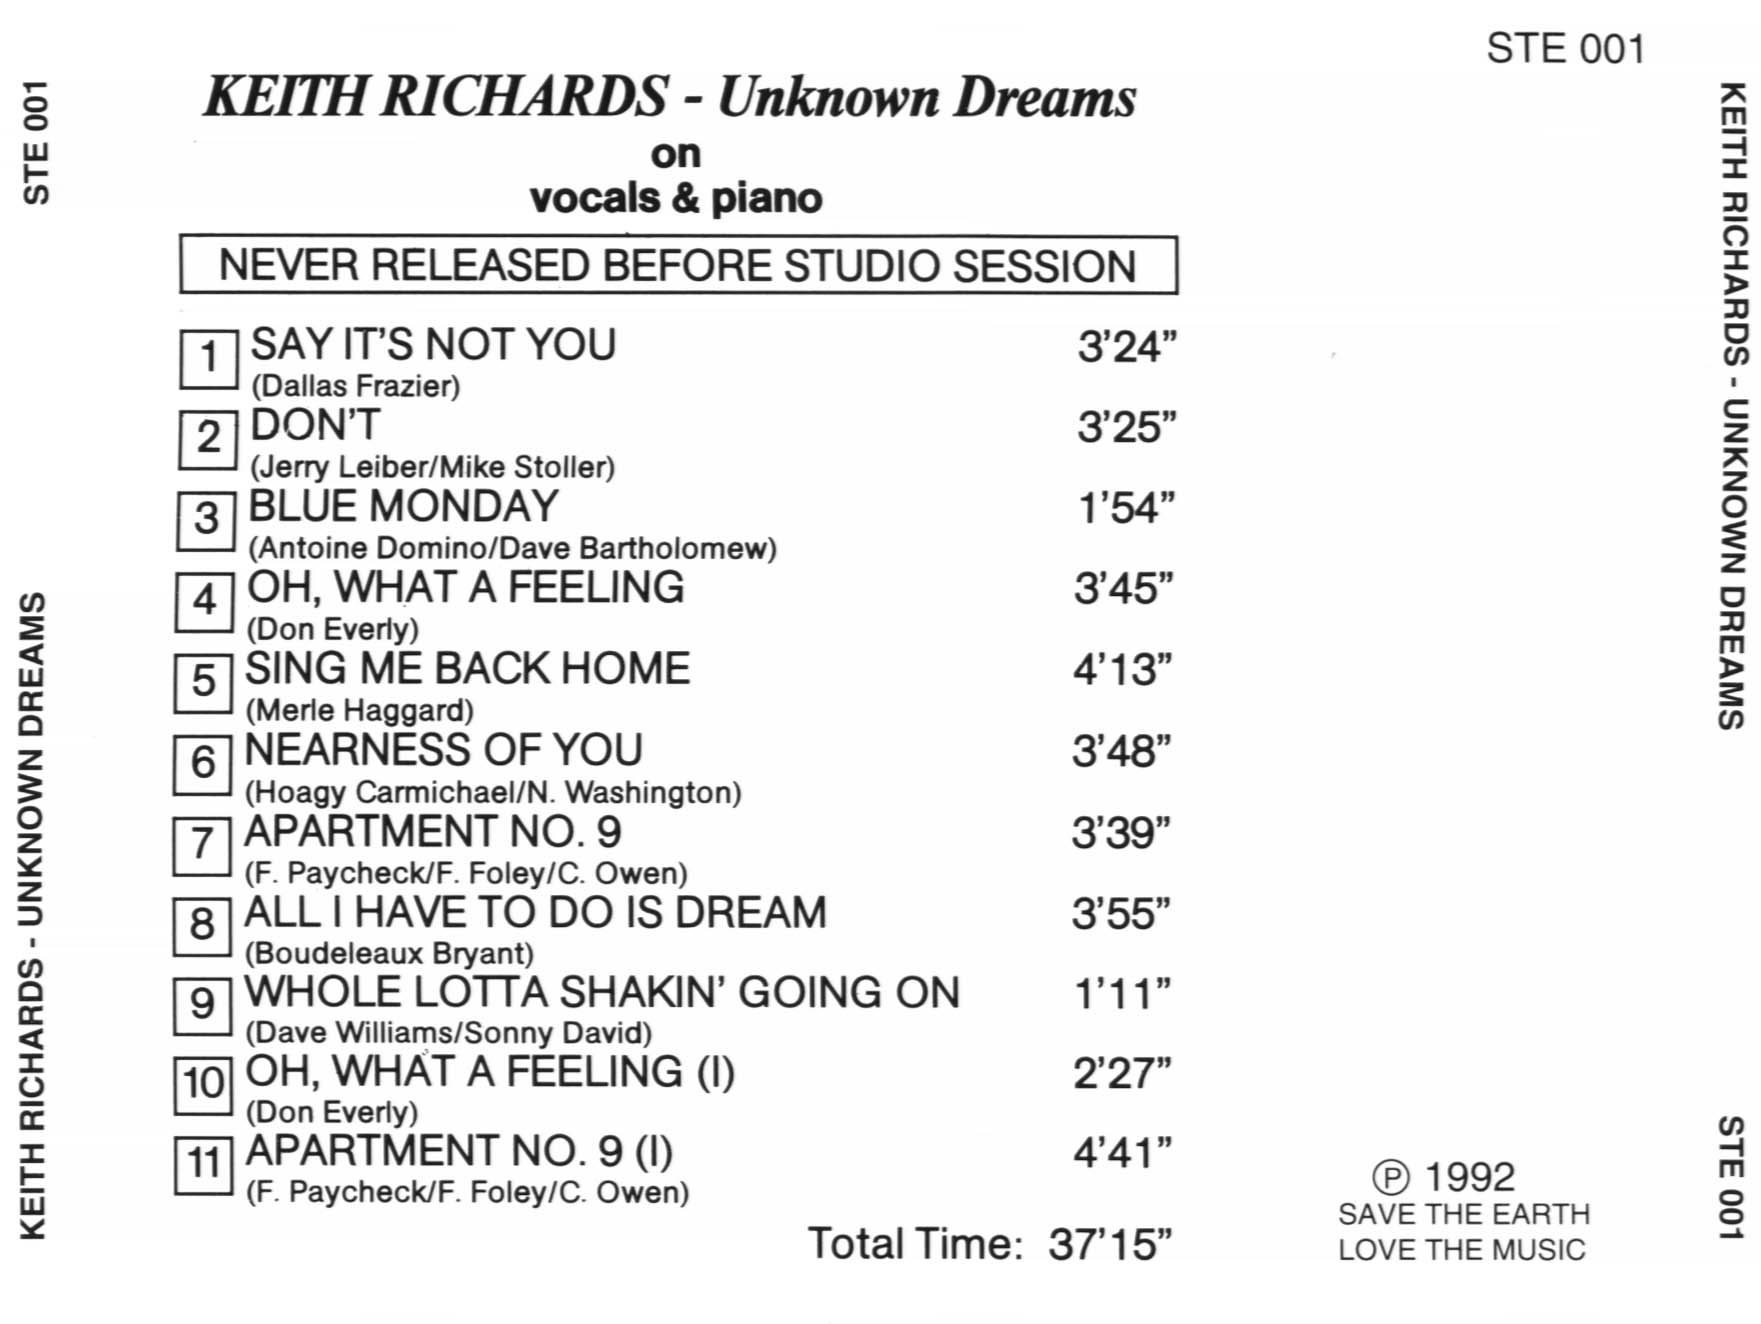 KeithRichards1981-05-25_28UnknownDreams3.jpg